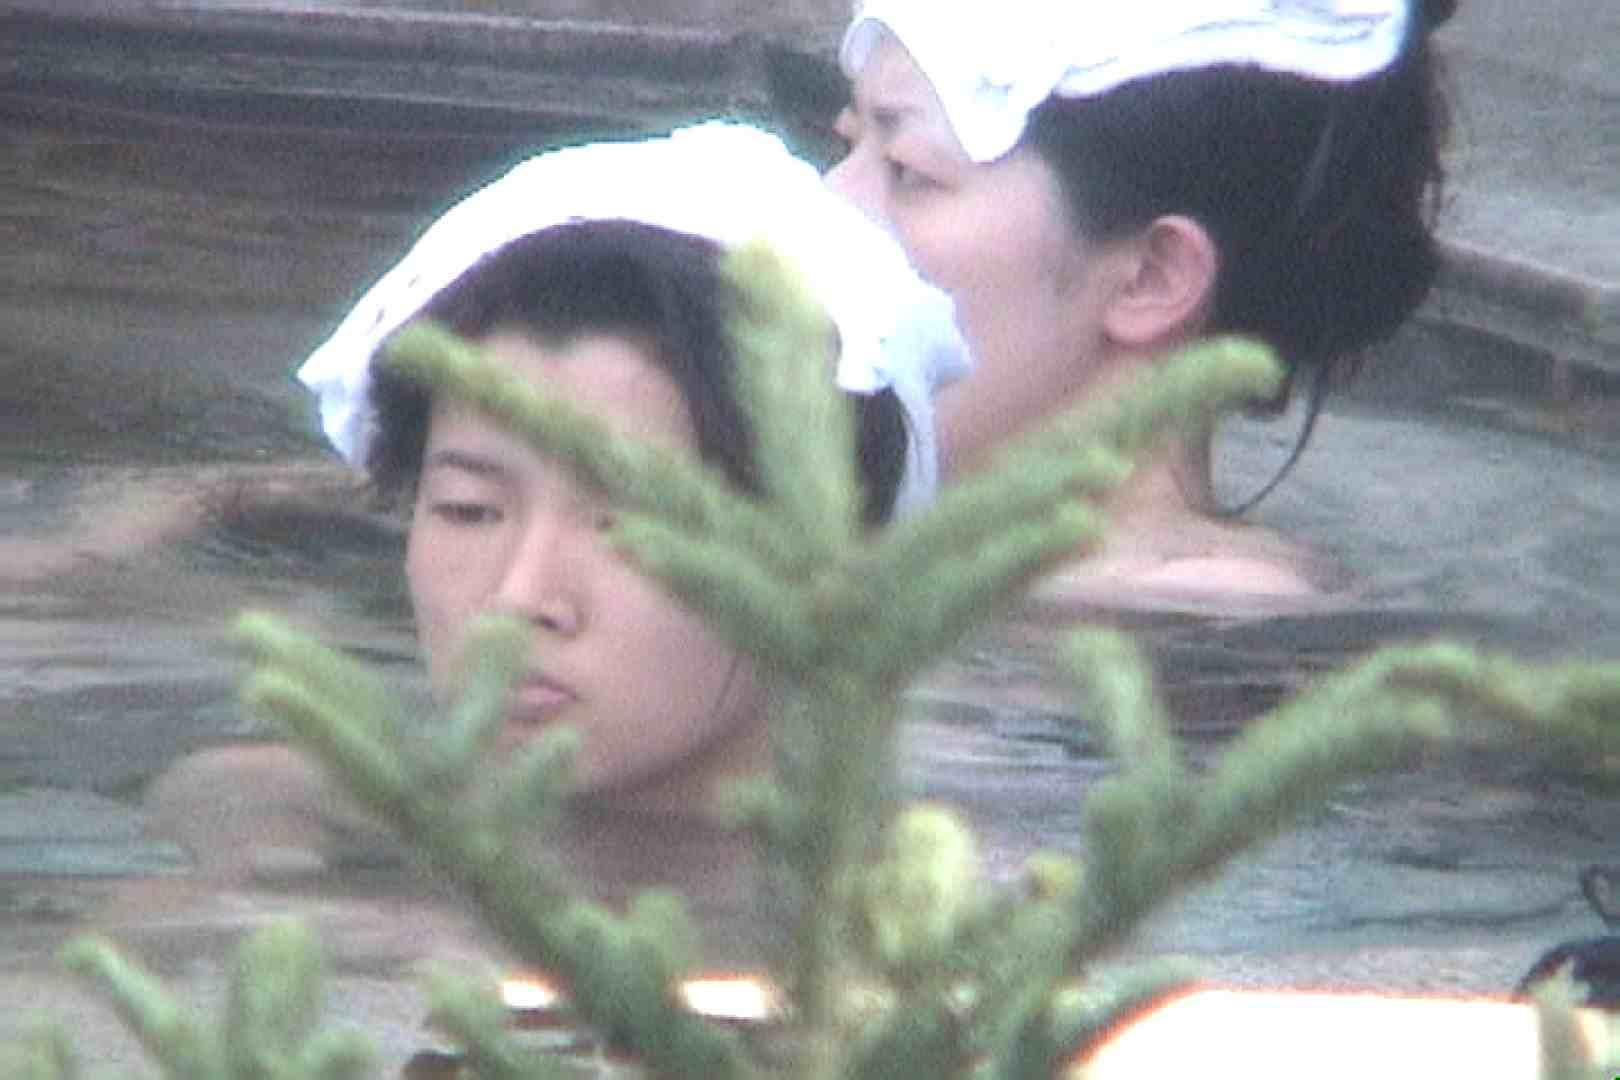 Aquaな露天風呂Vol.80【VIP限定】 盗撮大放出 濡れ場動画紹介 73連発 48